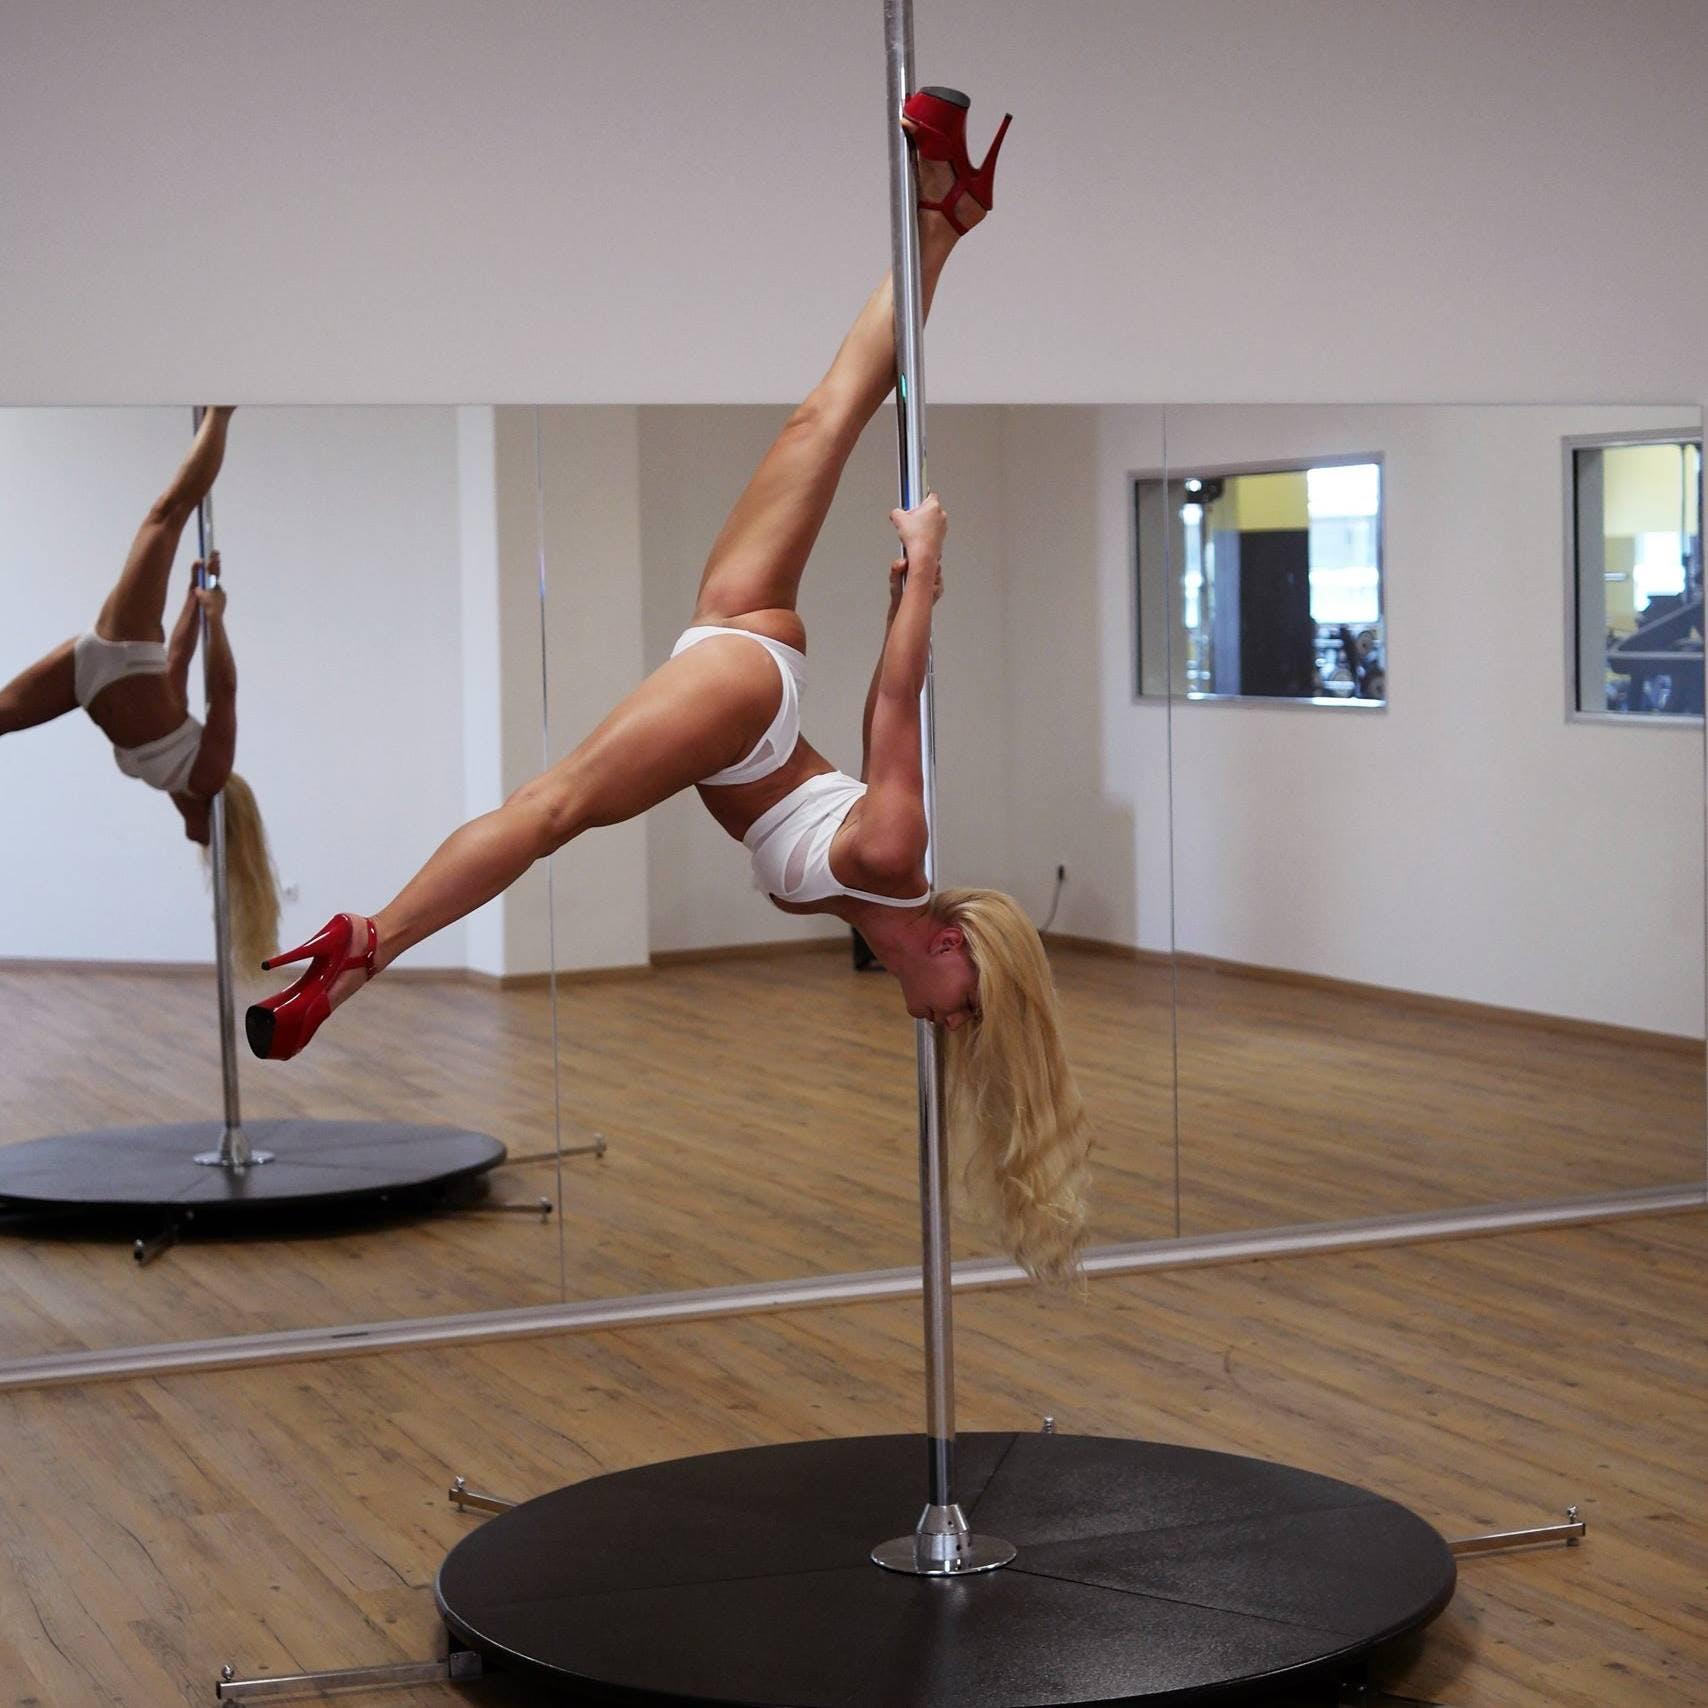 Free stock photo of naopolewear, pole dance, pole dancer, polewear